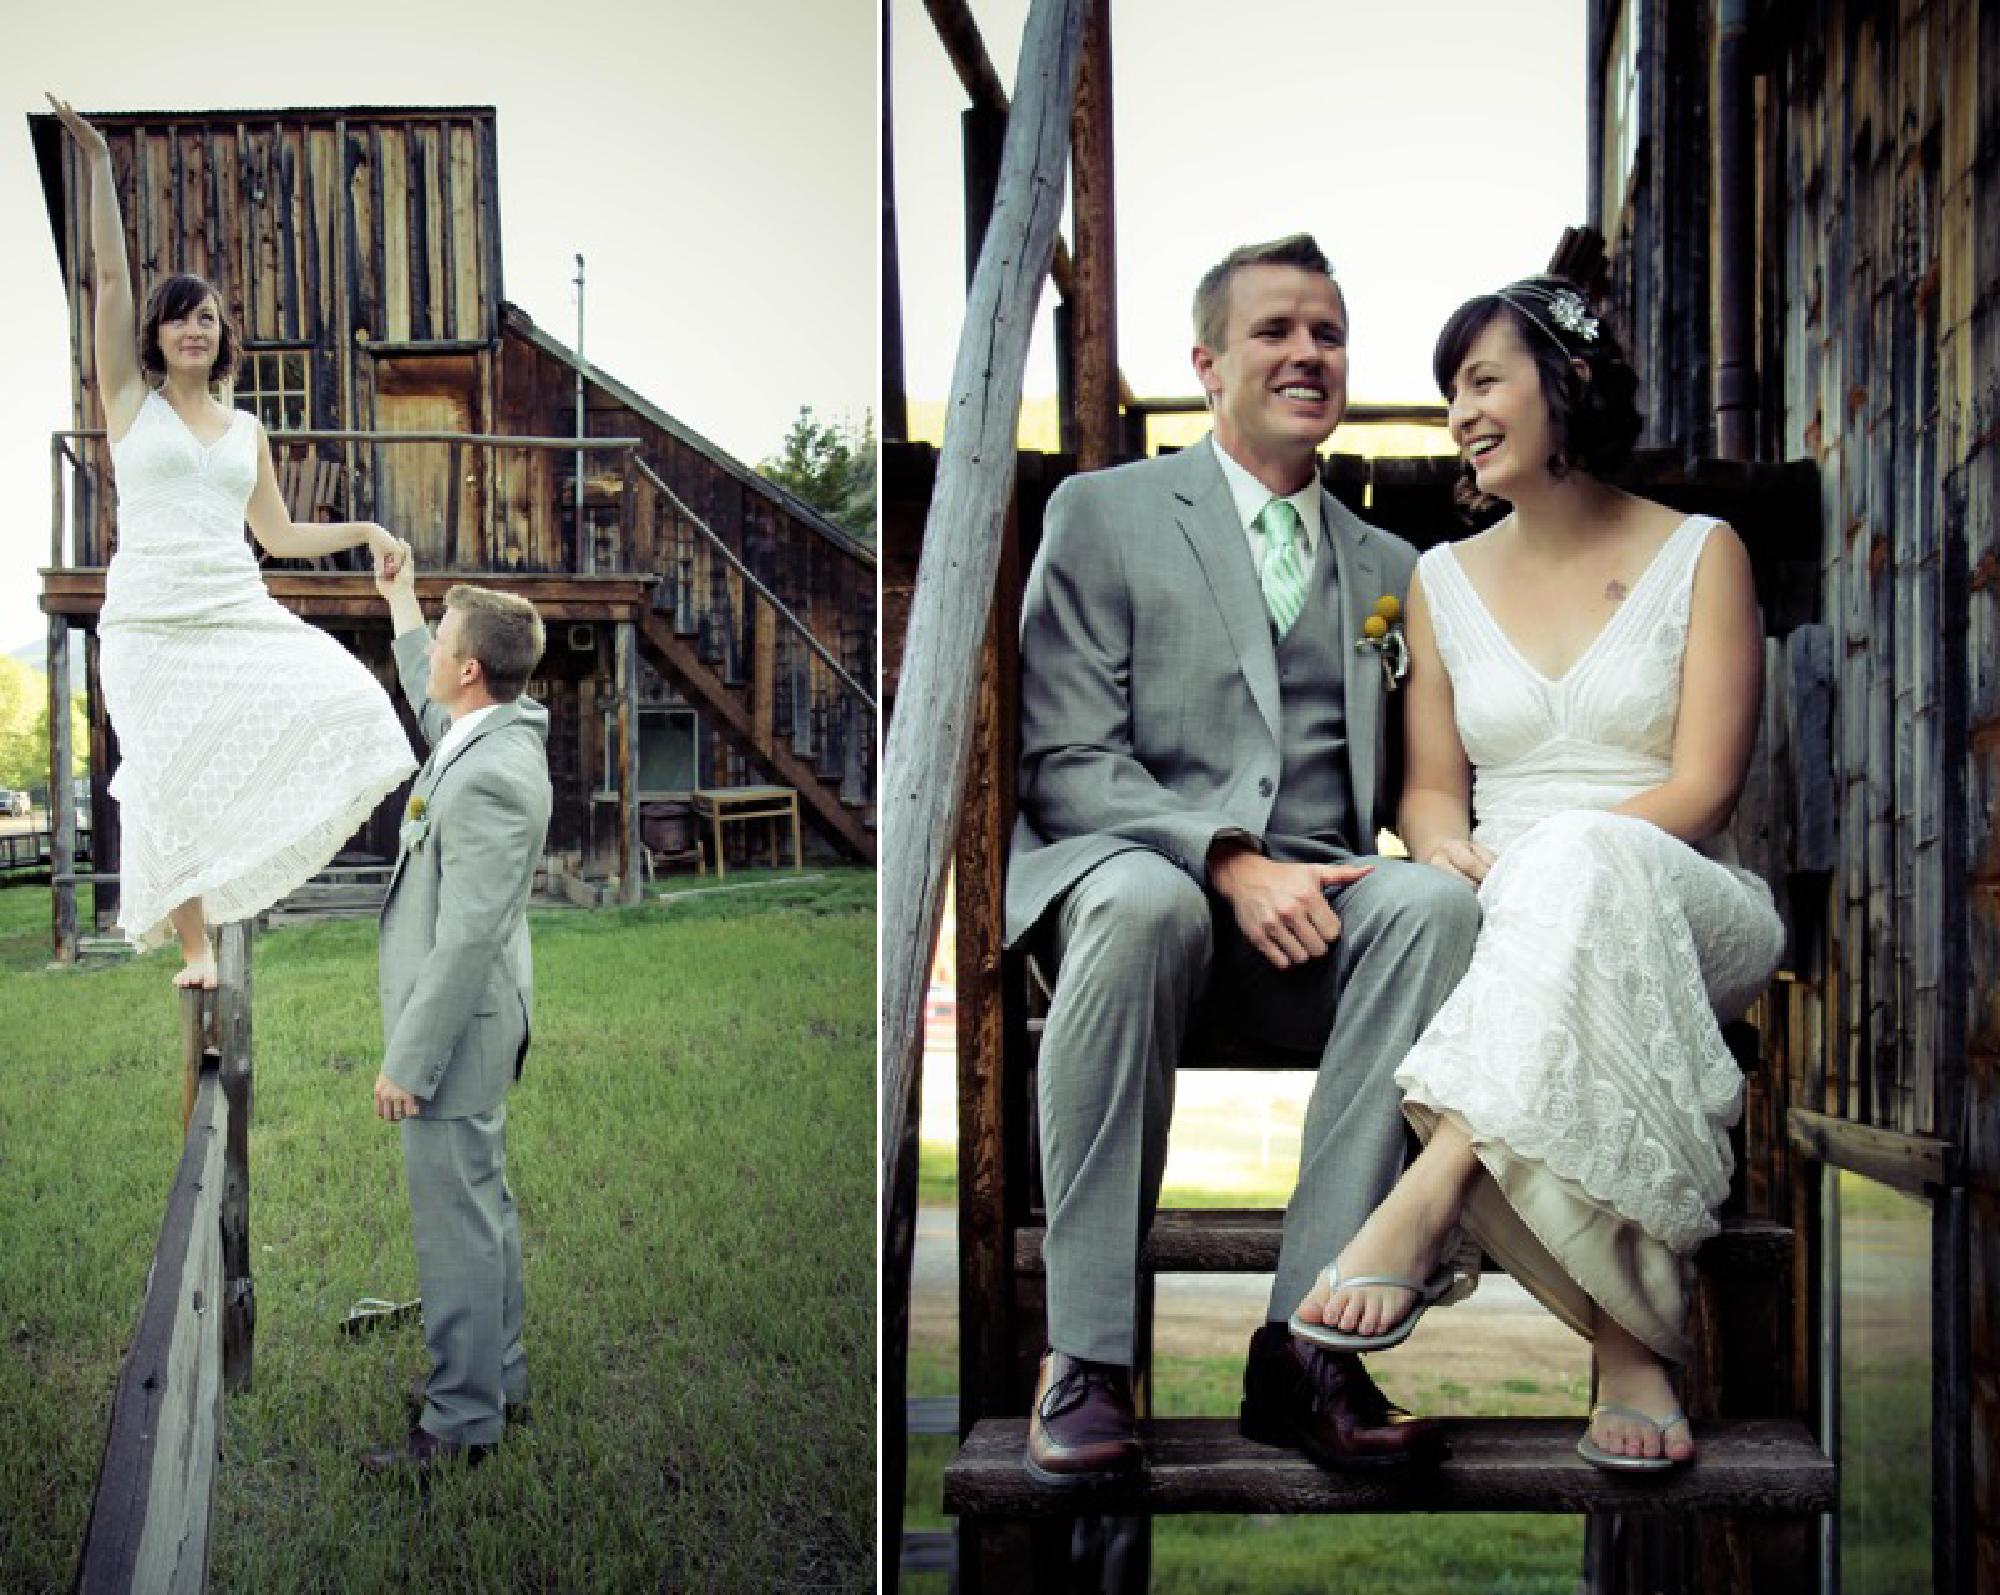 Kimberly_Eric_Mountain_Town_Wedding_6.jpeg